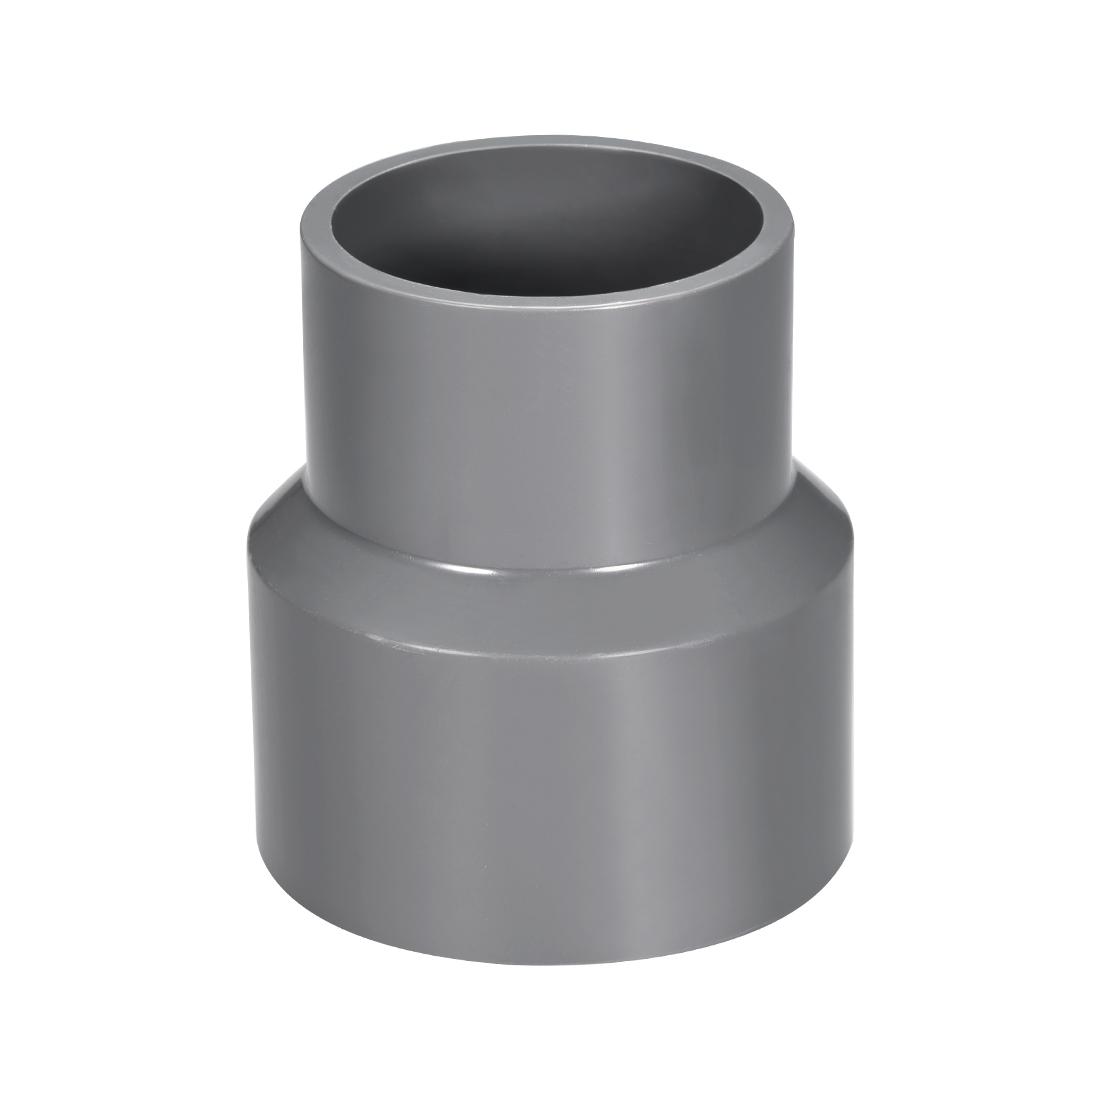 63mm x 50mm PVC Reducing Coupling Hub by Hub, DWV Pipe Fittings Gray